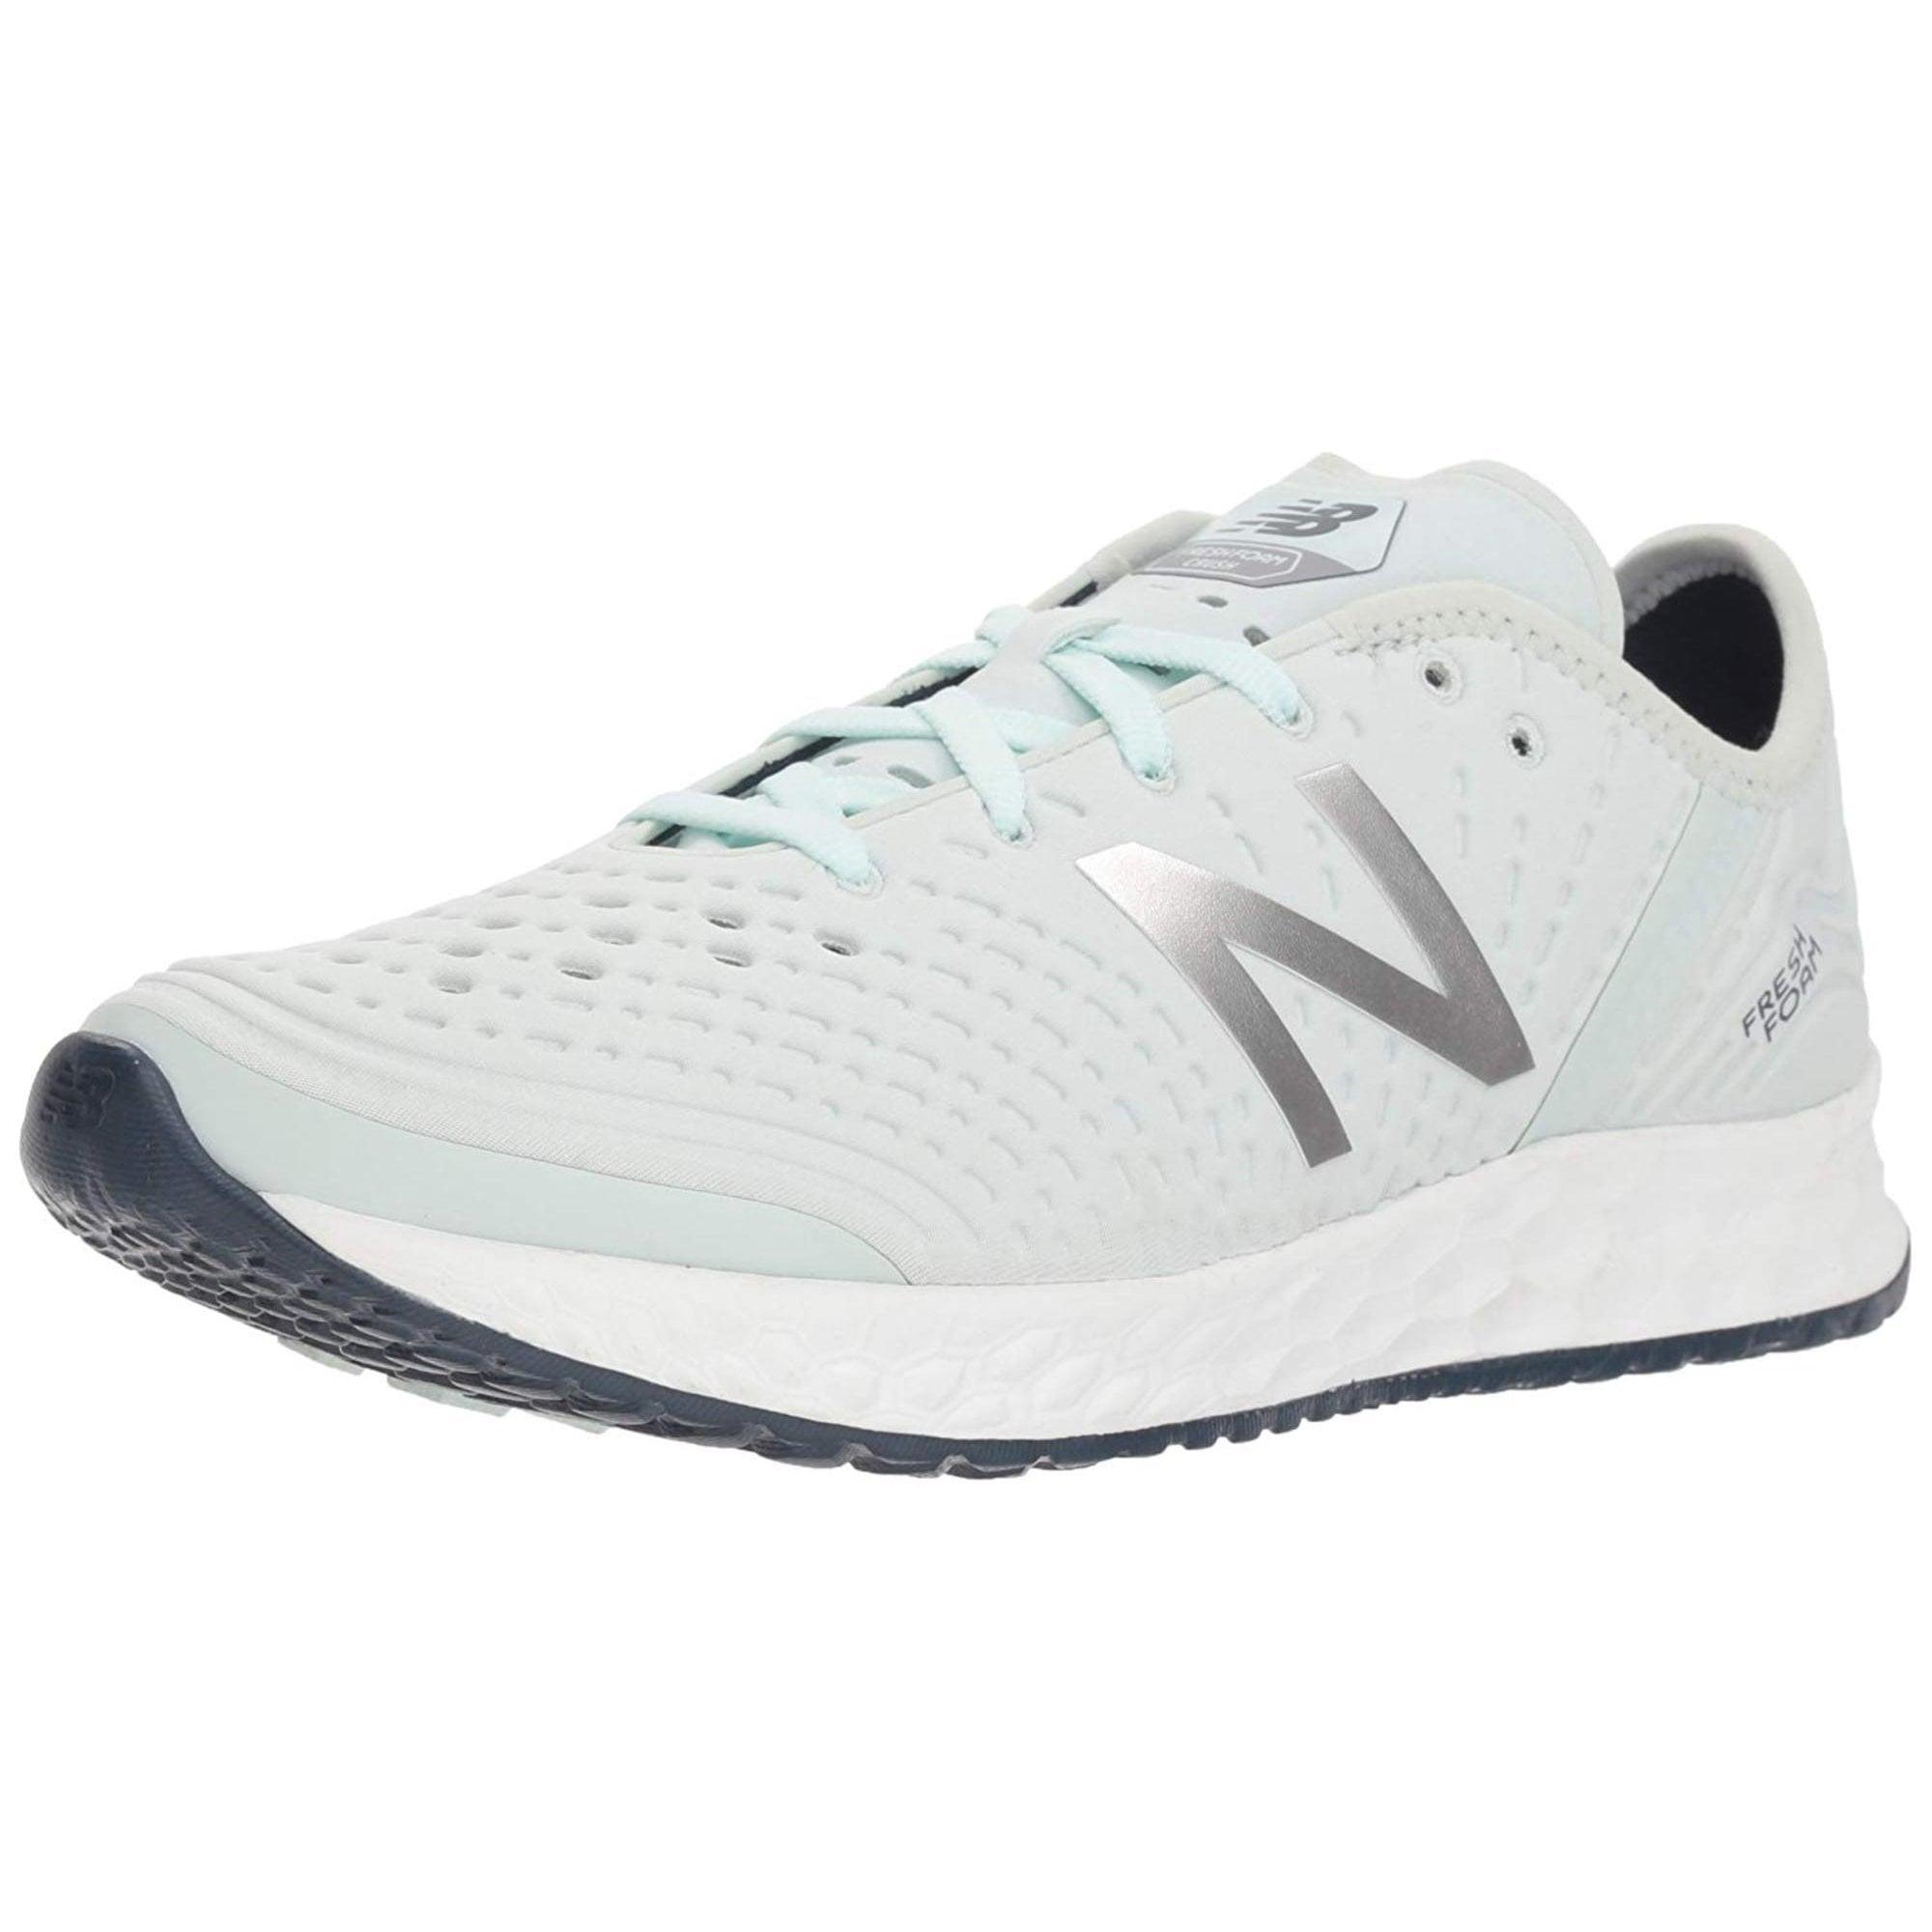 walmart running shoes womens